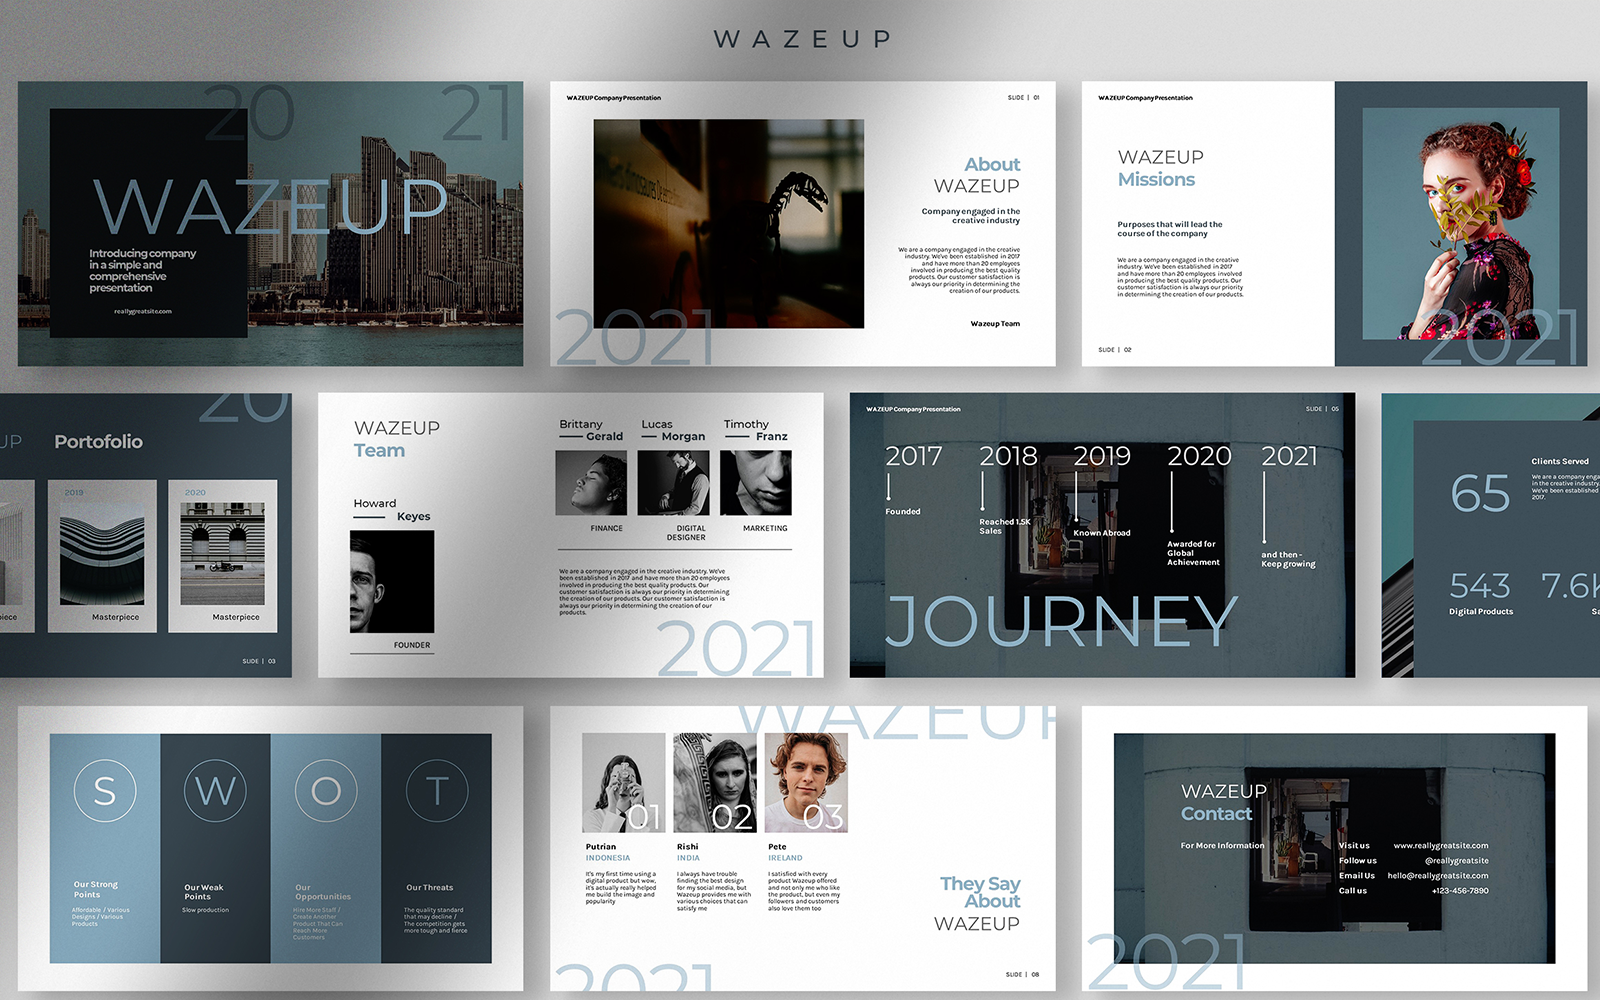 Wazeup Company Profile Presentation PowerPoint Template